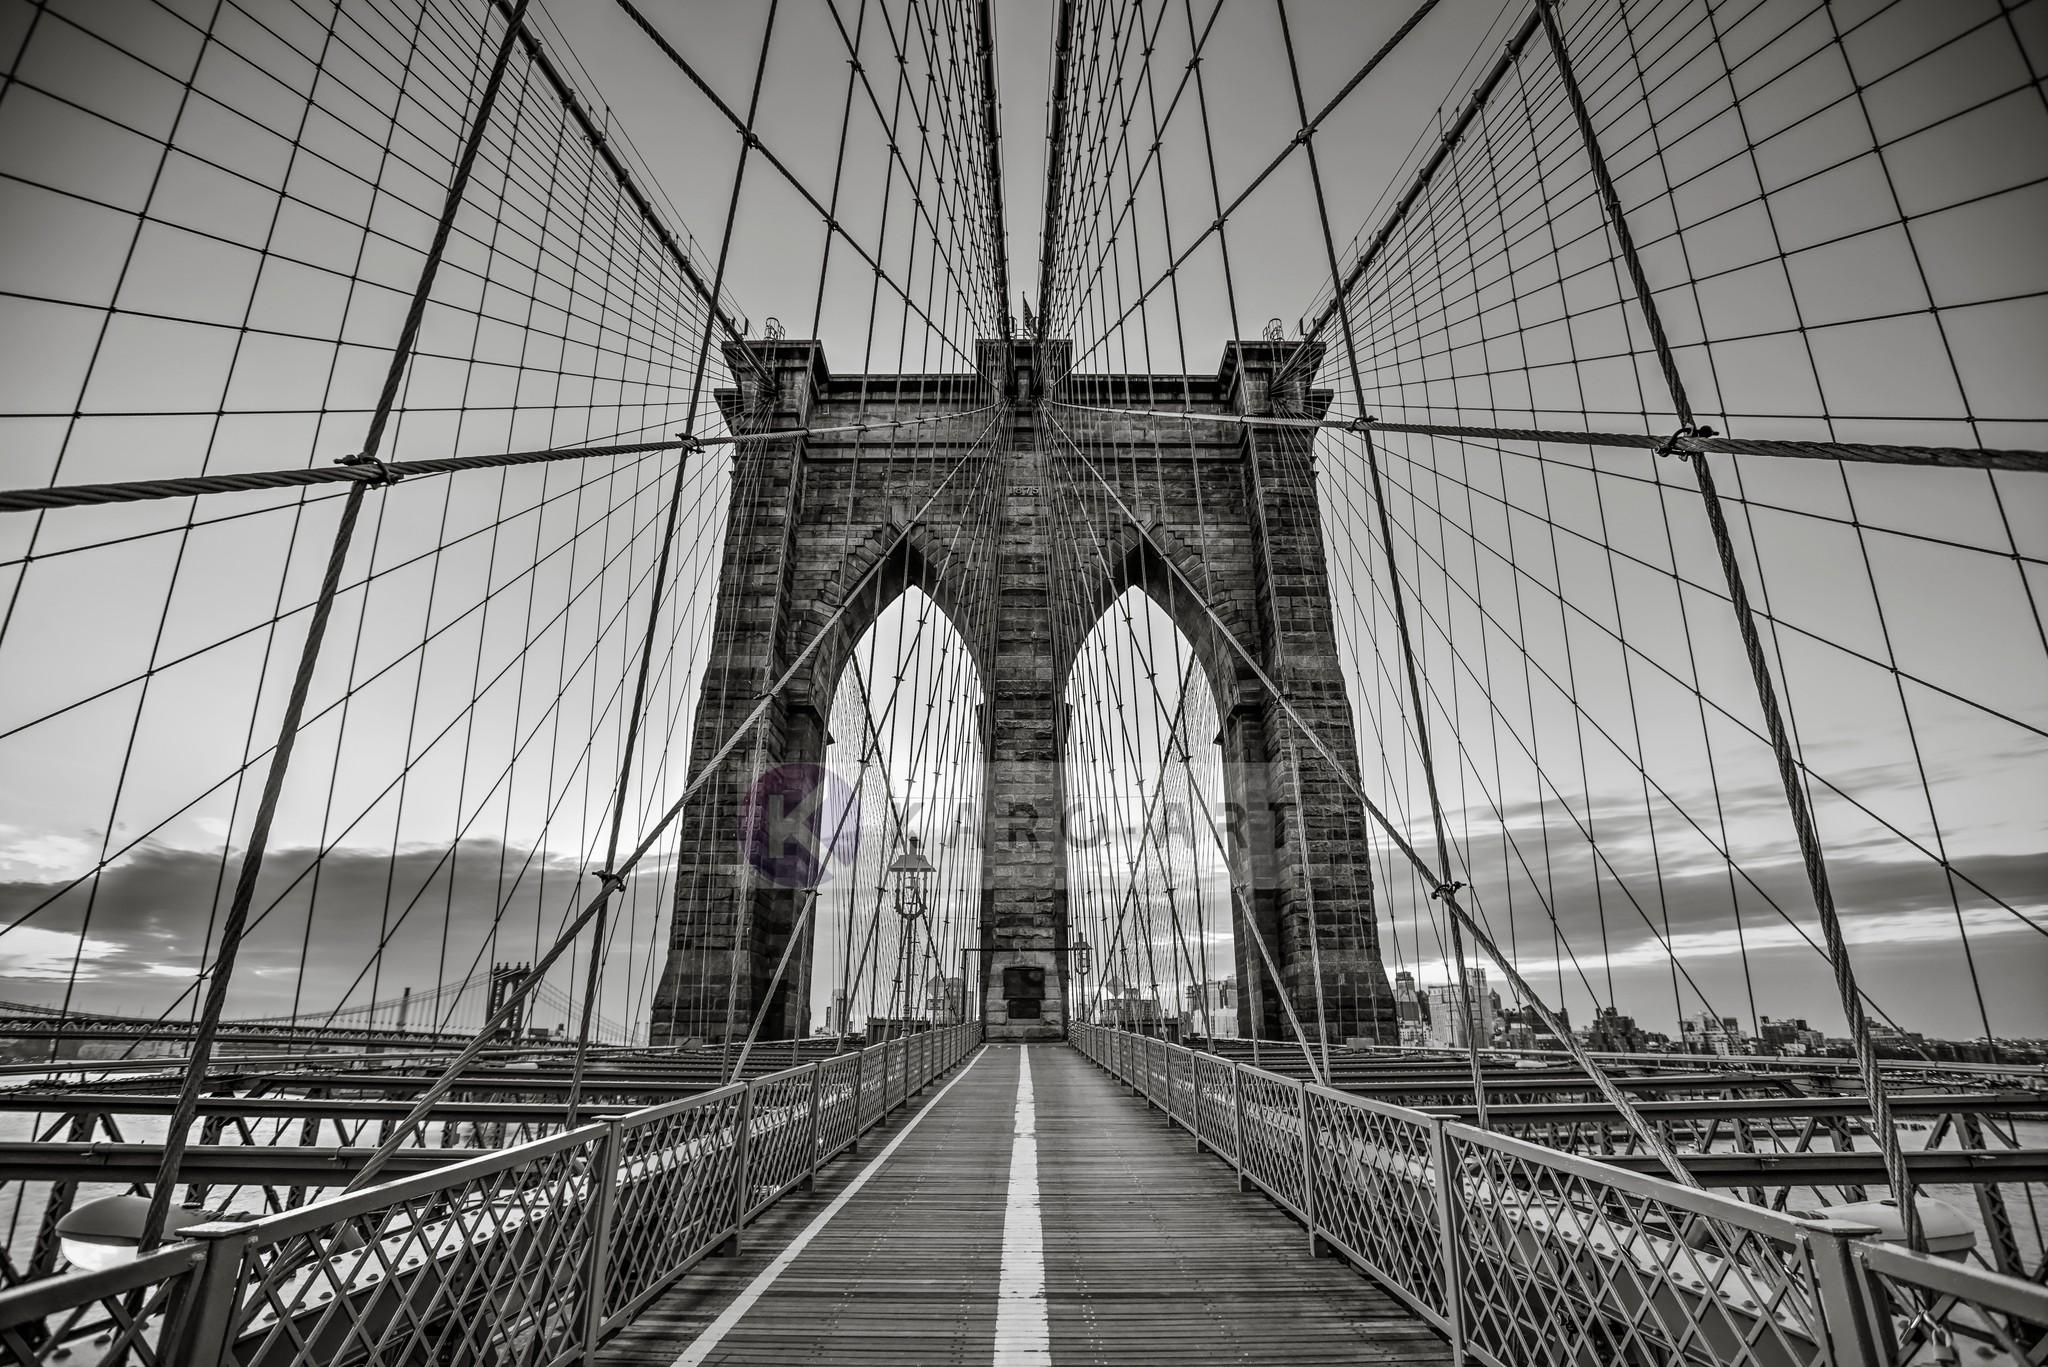 Afbeelding op acrylglas - Brooklyn Bridge Zwart Wit, New York